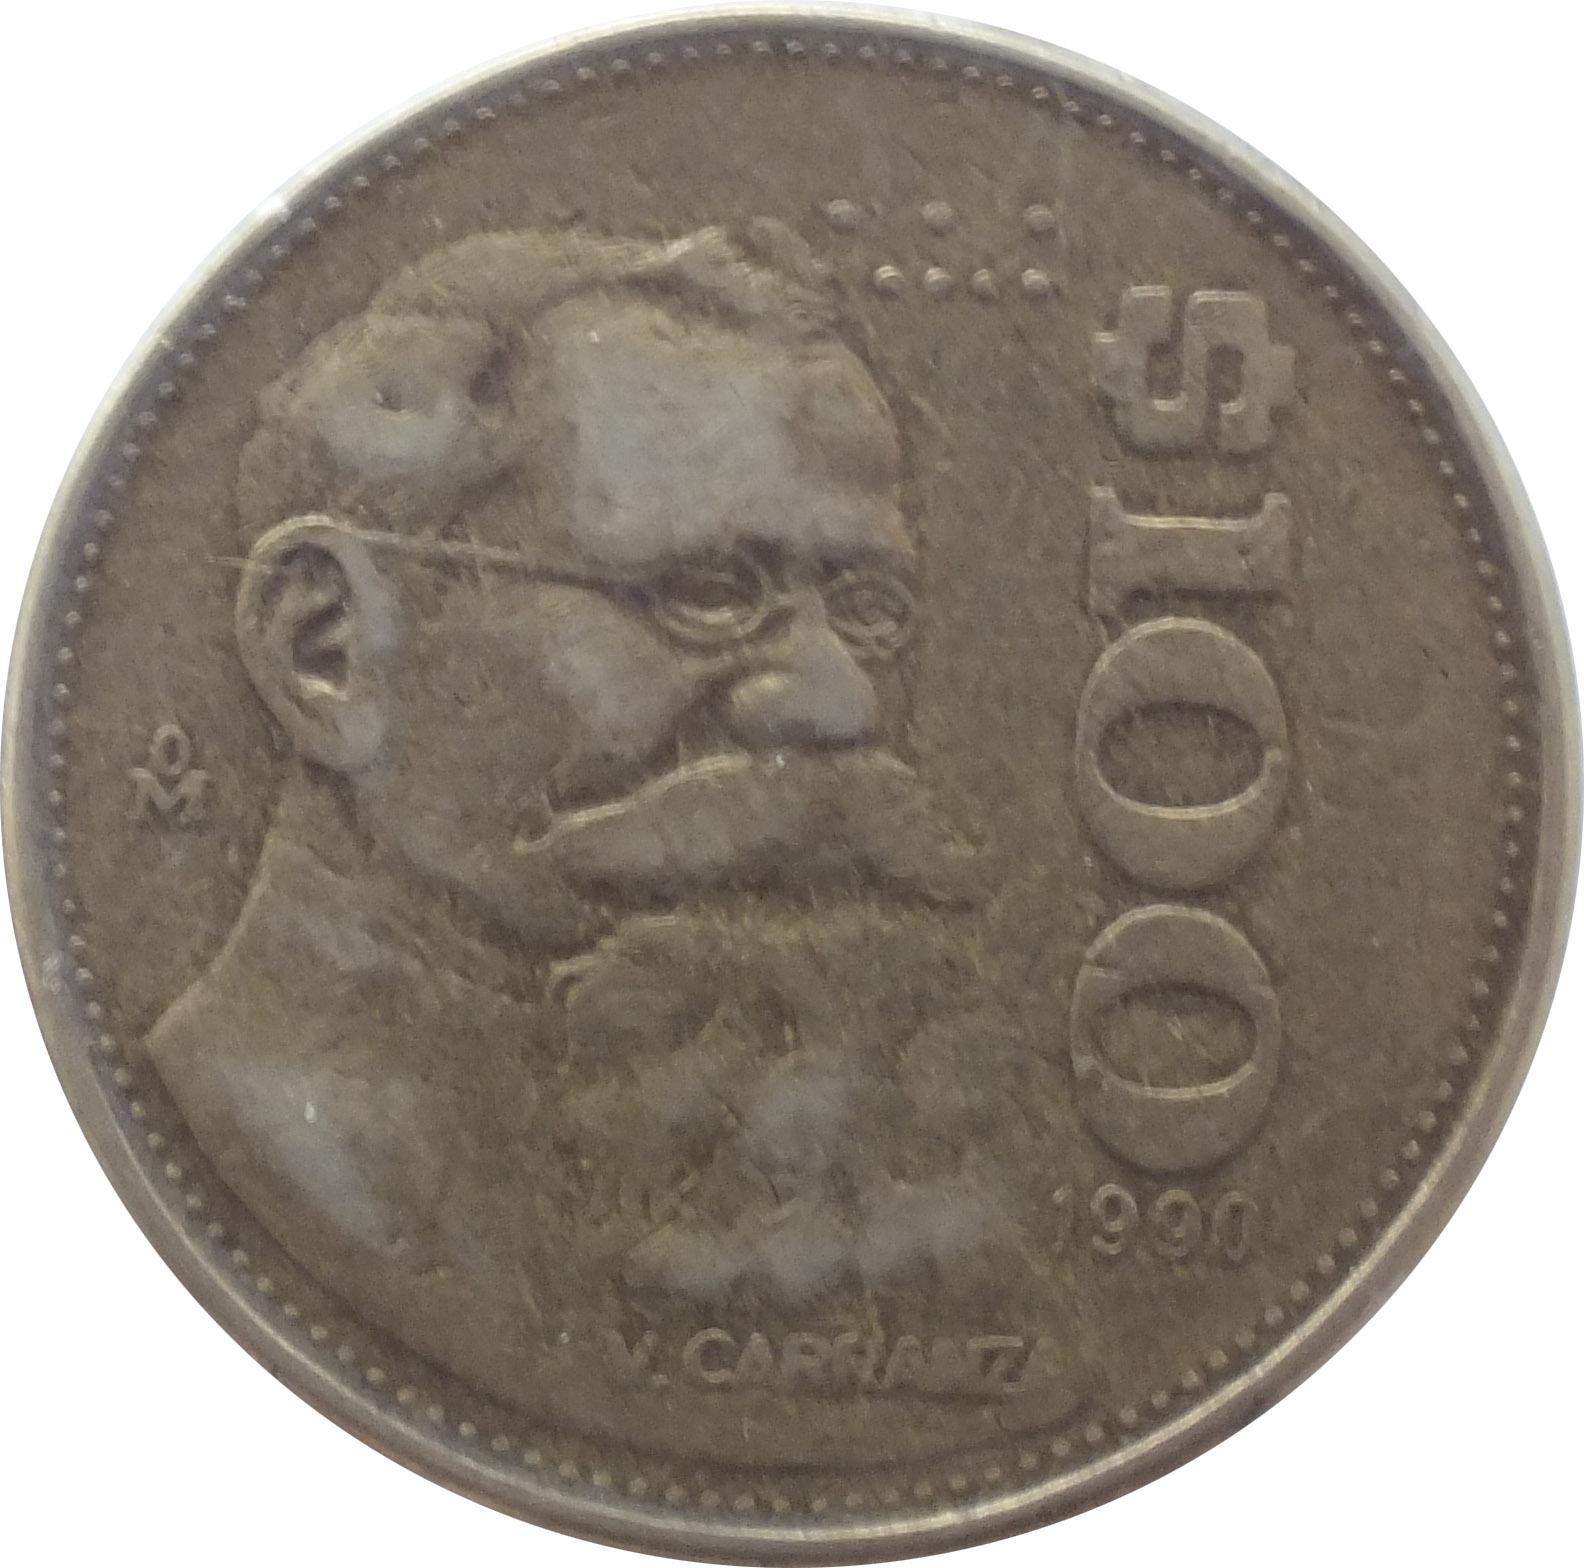 100 Pesos 1984 1992 Mexico Km 493 Coinsbook